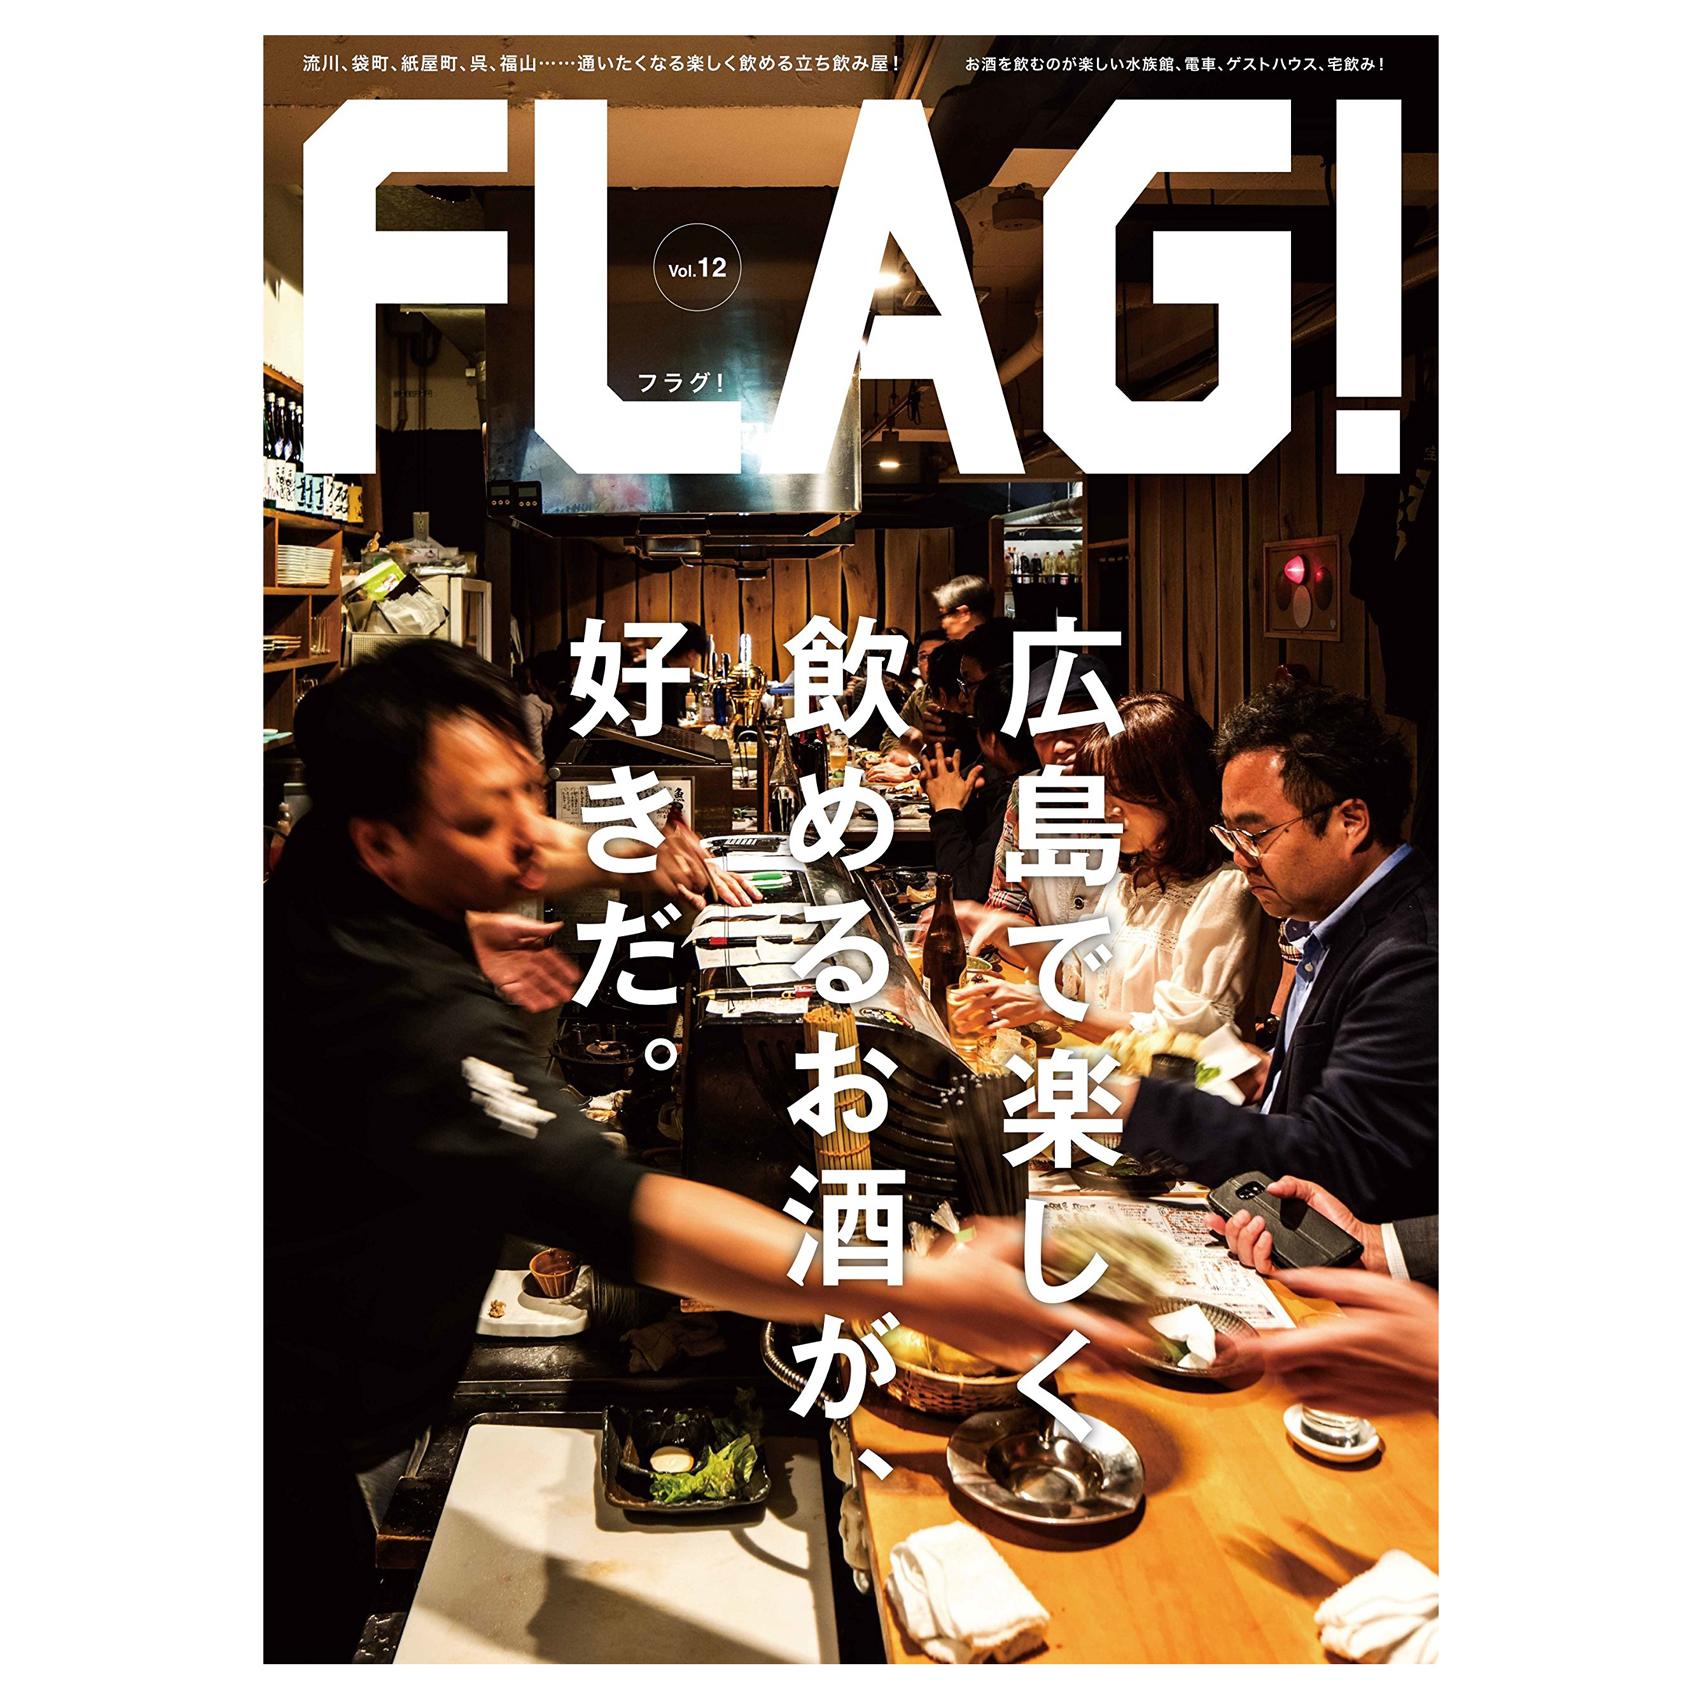 flag12cropped.jpg